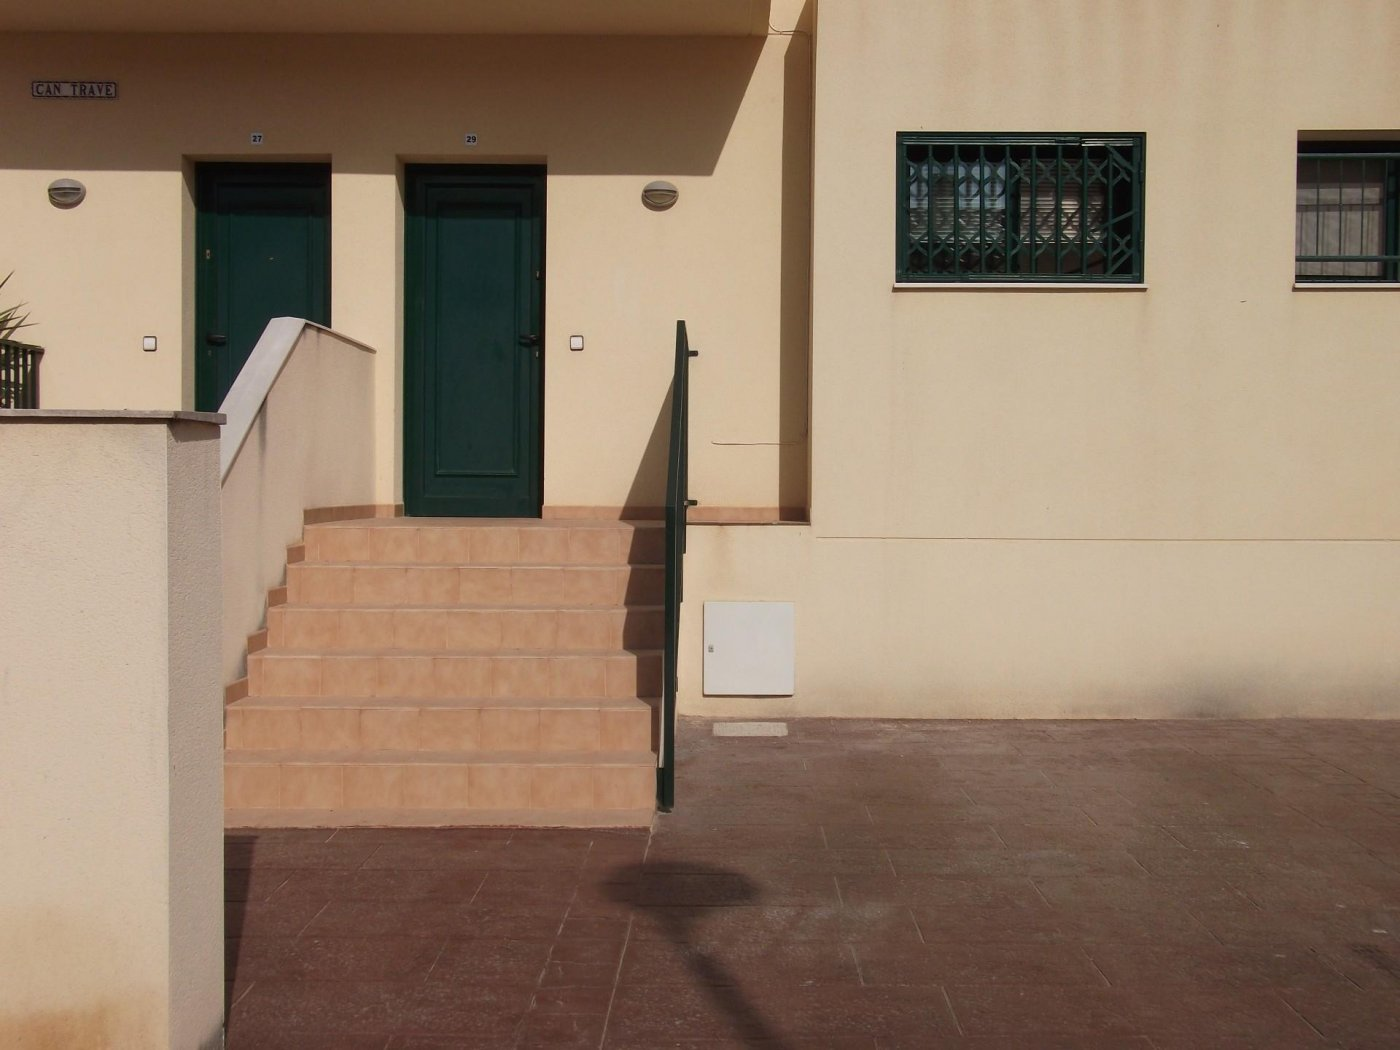 Townhouse for sale in Sant jaume, Sant Jaume d'Enveja